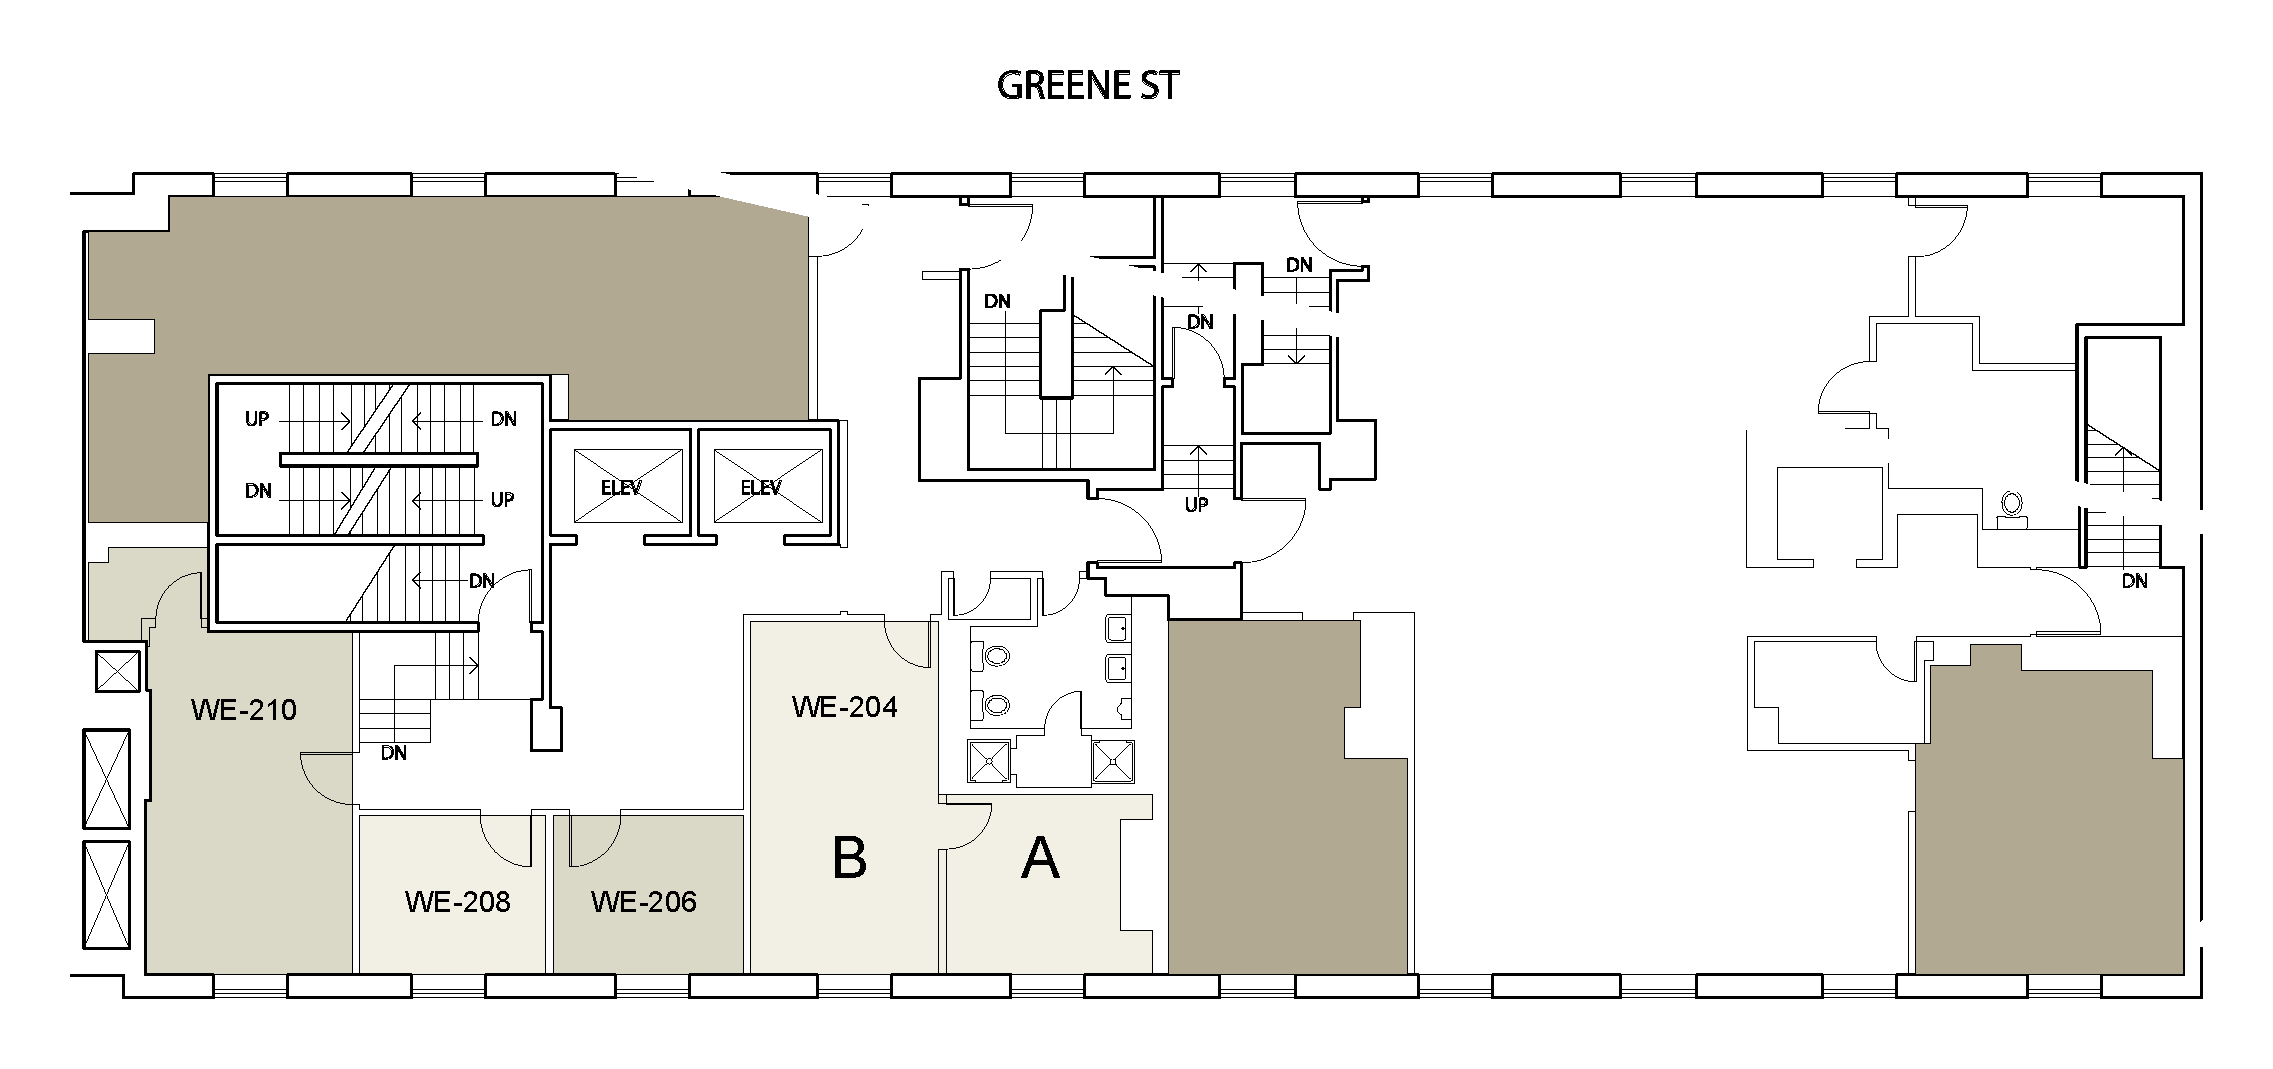 Nyu Carlyle Court Floor Plan Carlyle Court Nyu Dorm Floor Plan Thefloors Co